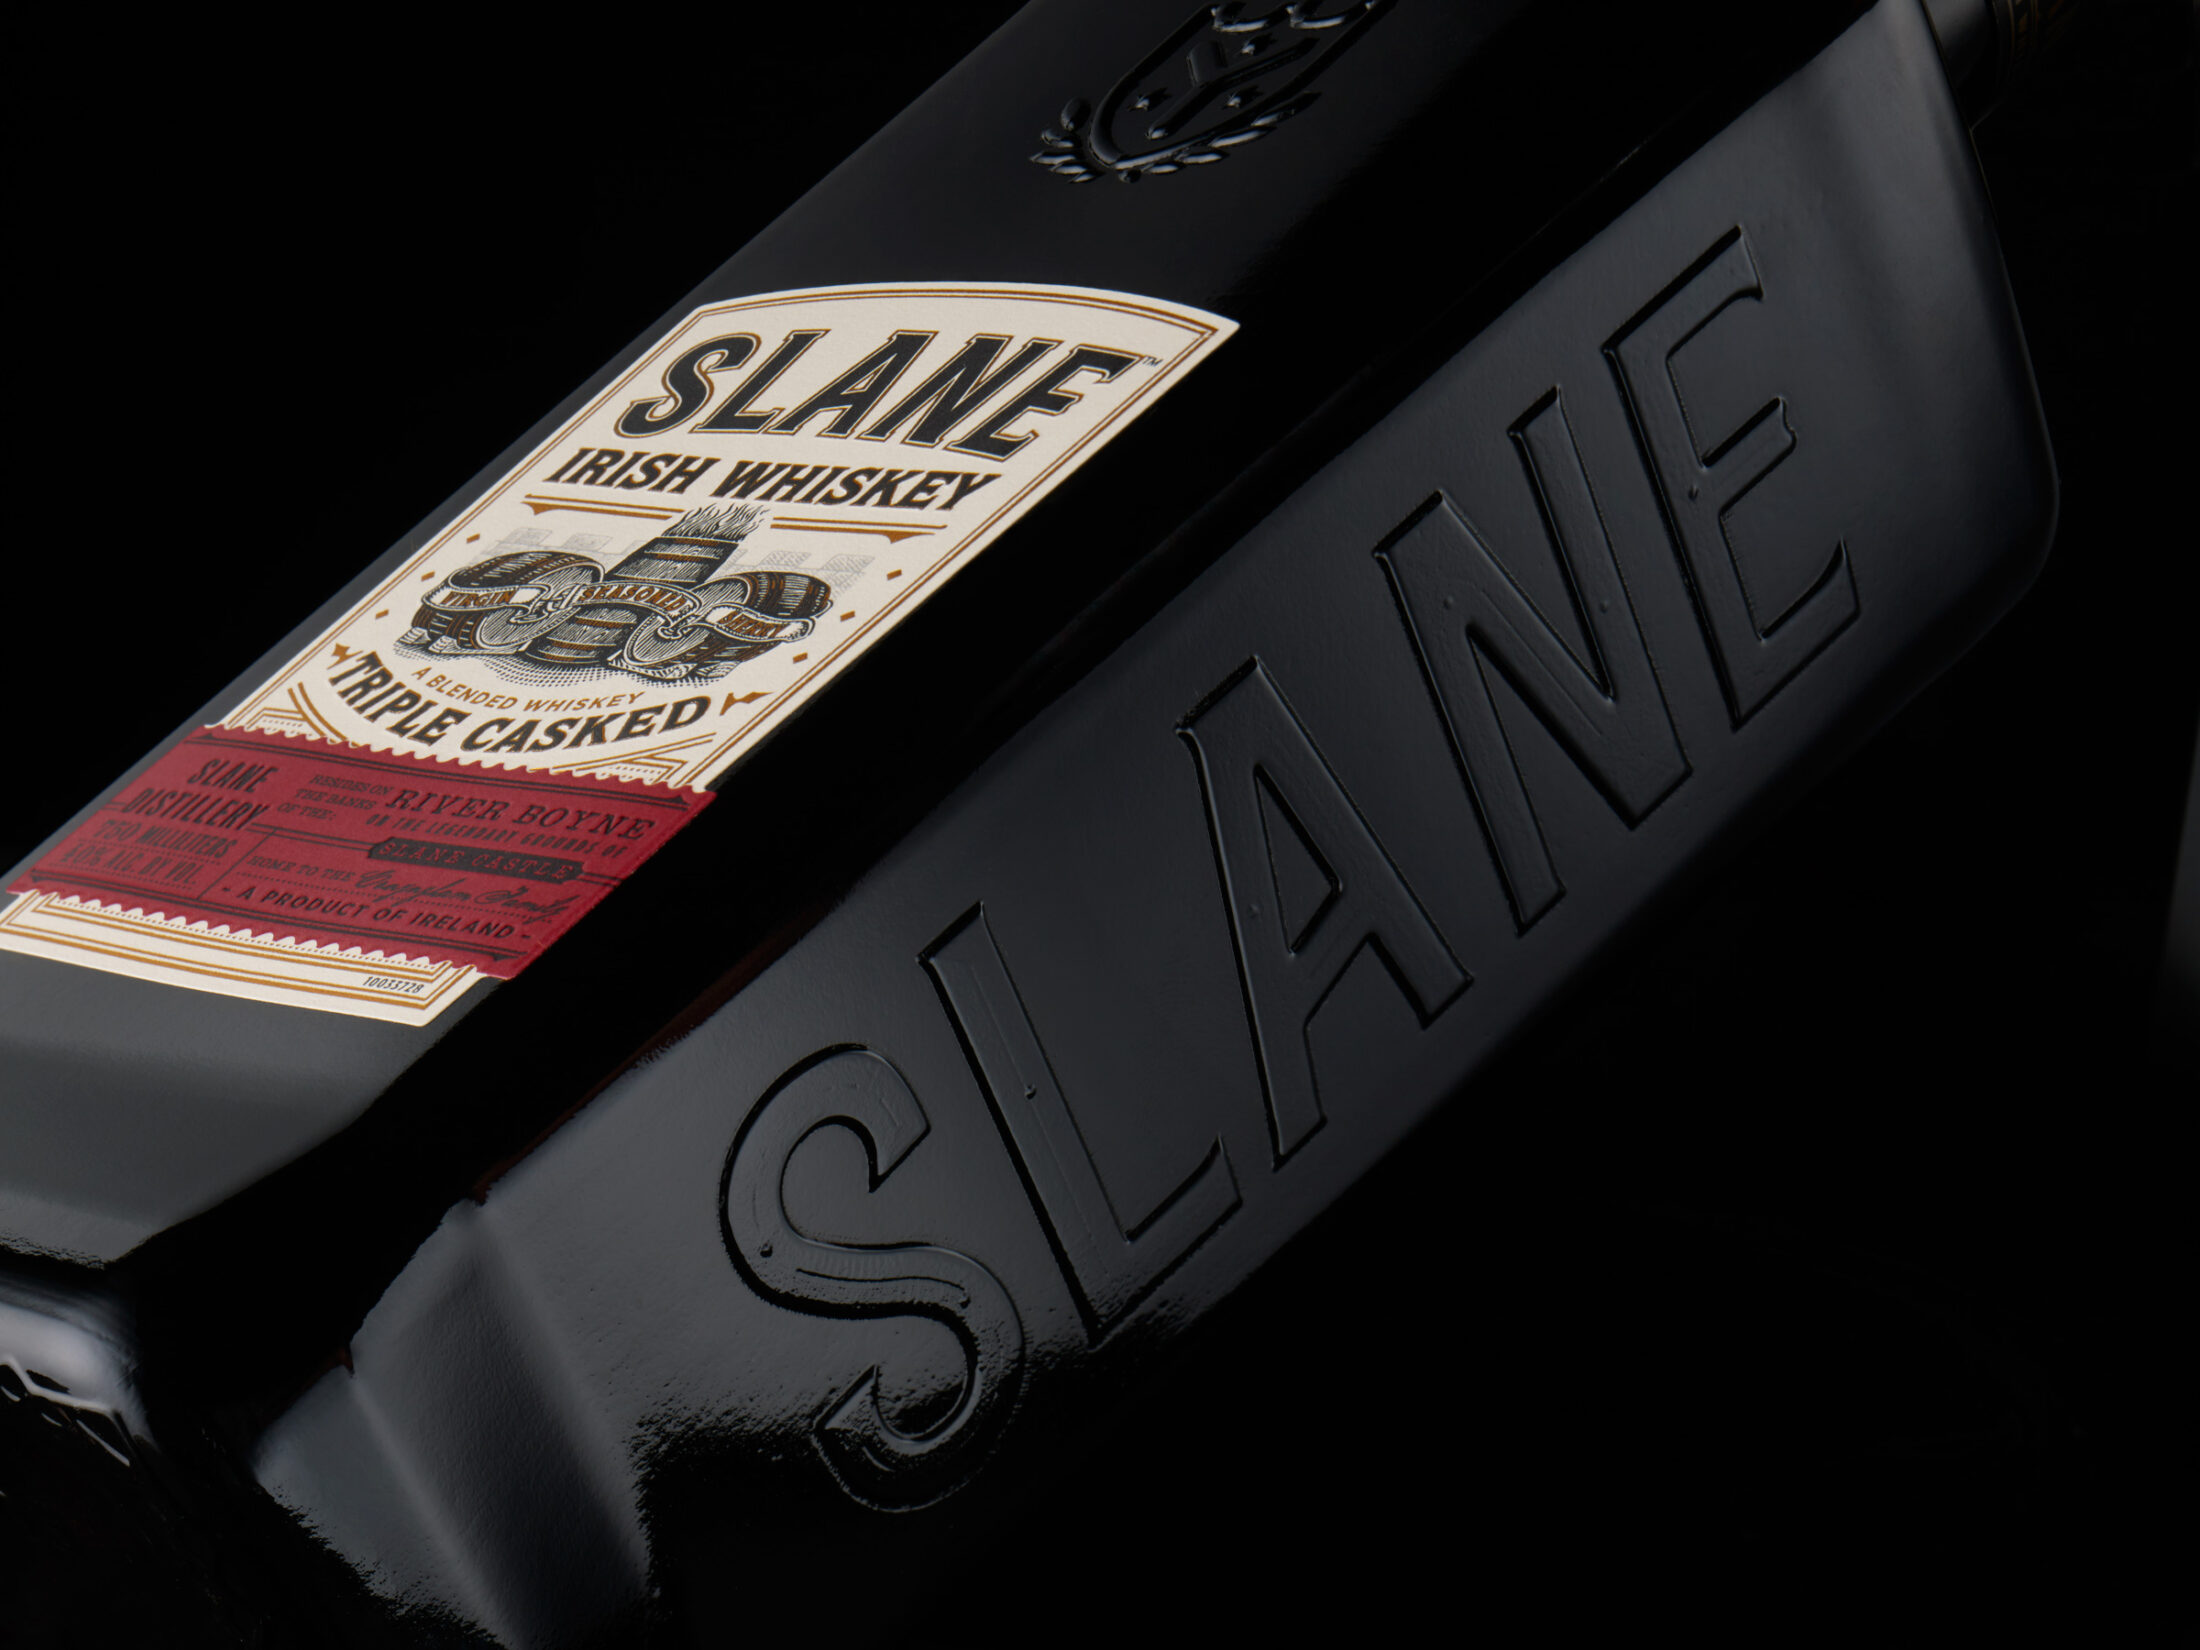 Slane Irish Whiskey - Chad Michael Studio